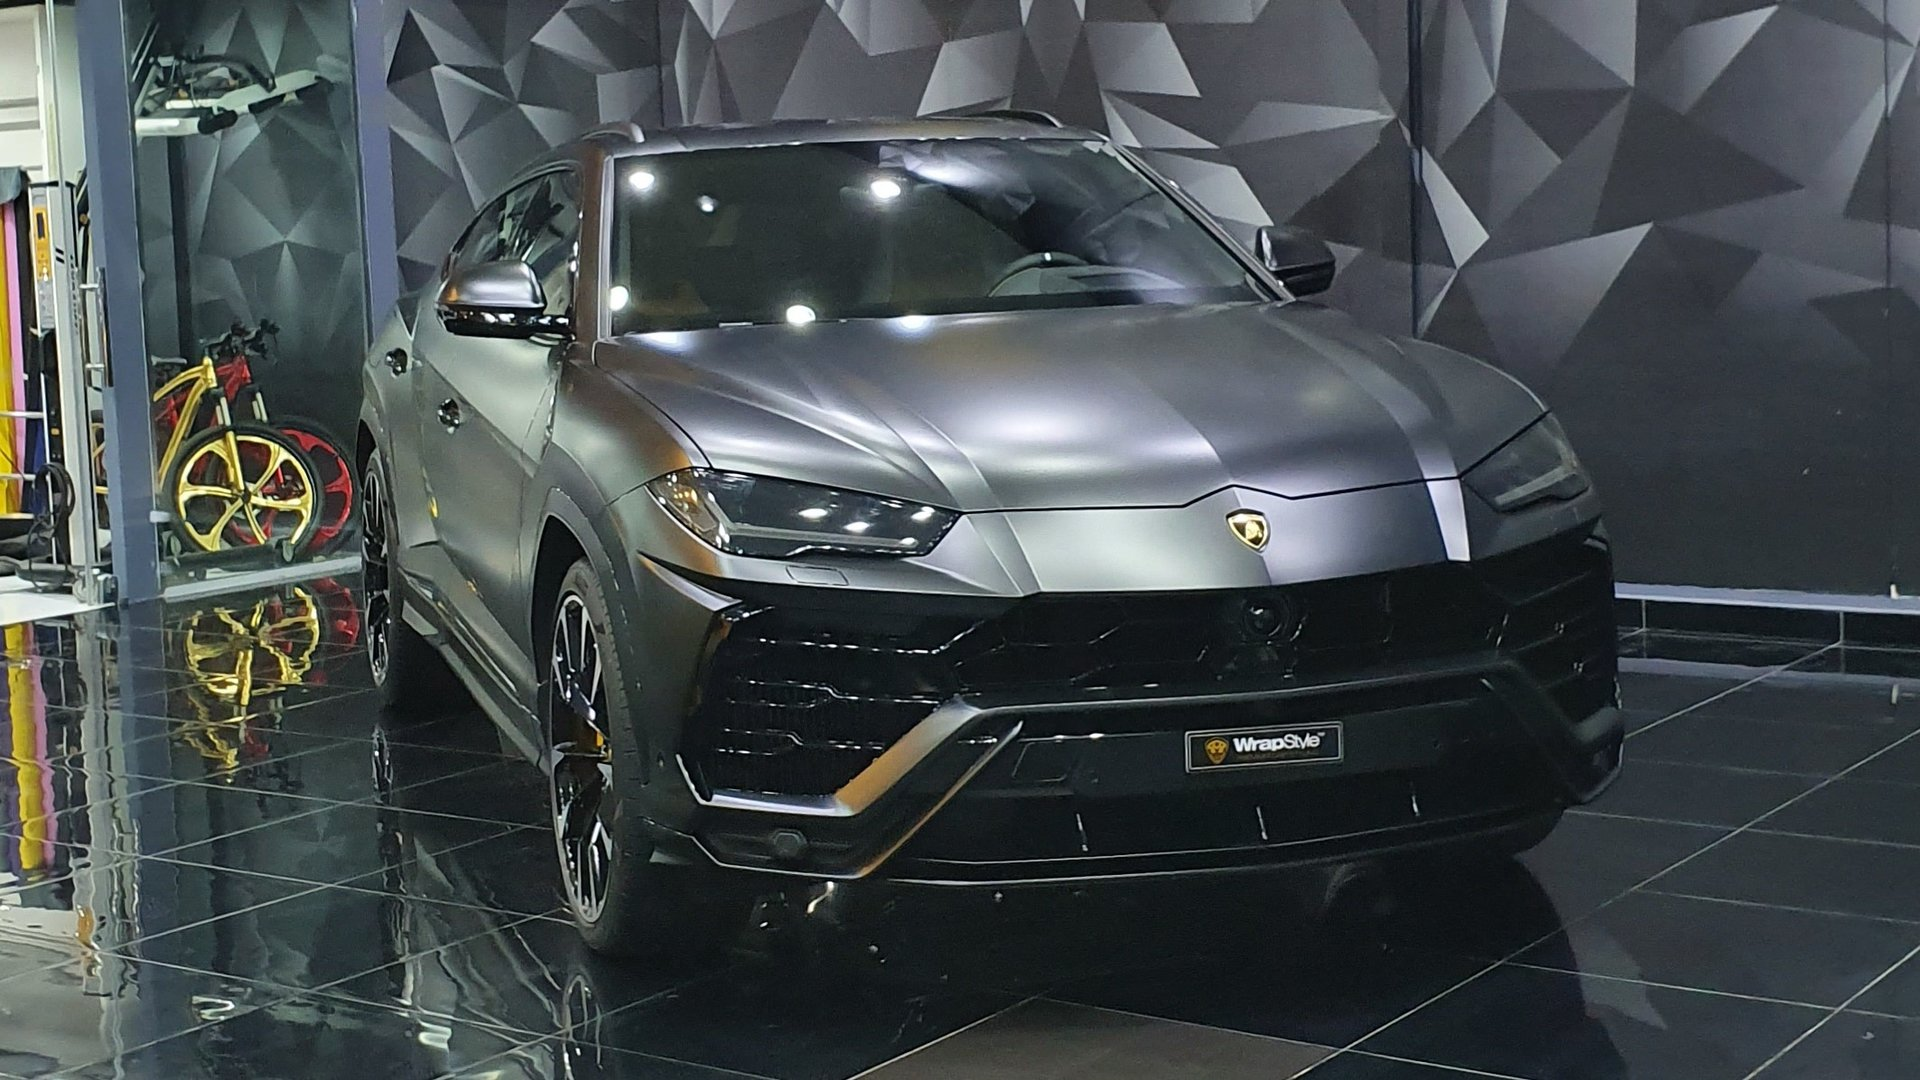 Lamborghini Urus Grey Satin Wrap Wrapstyle